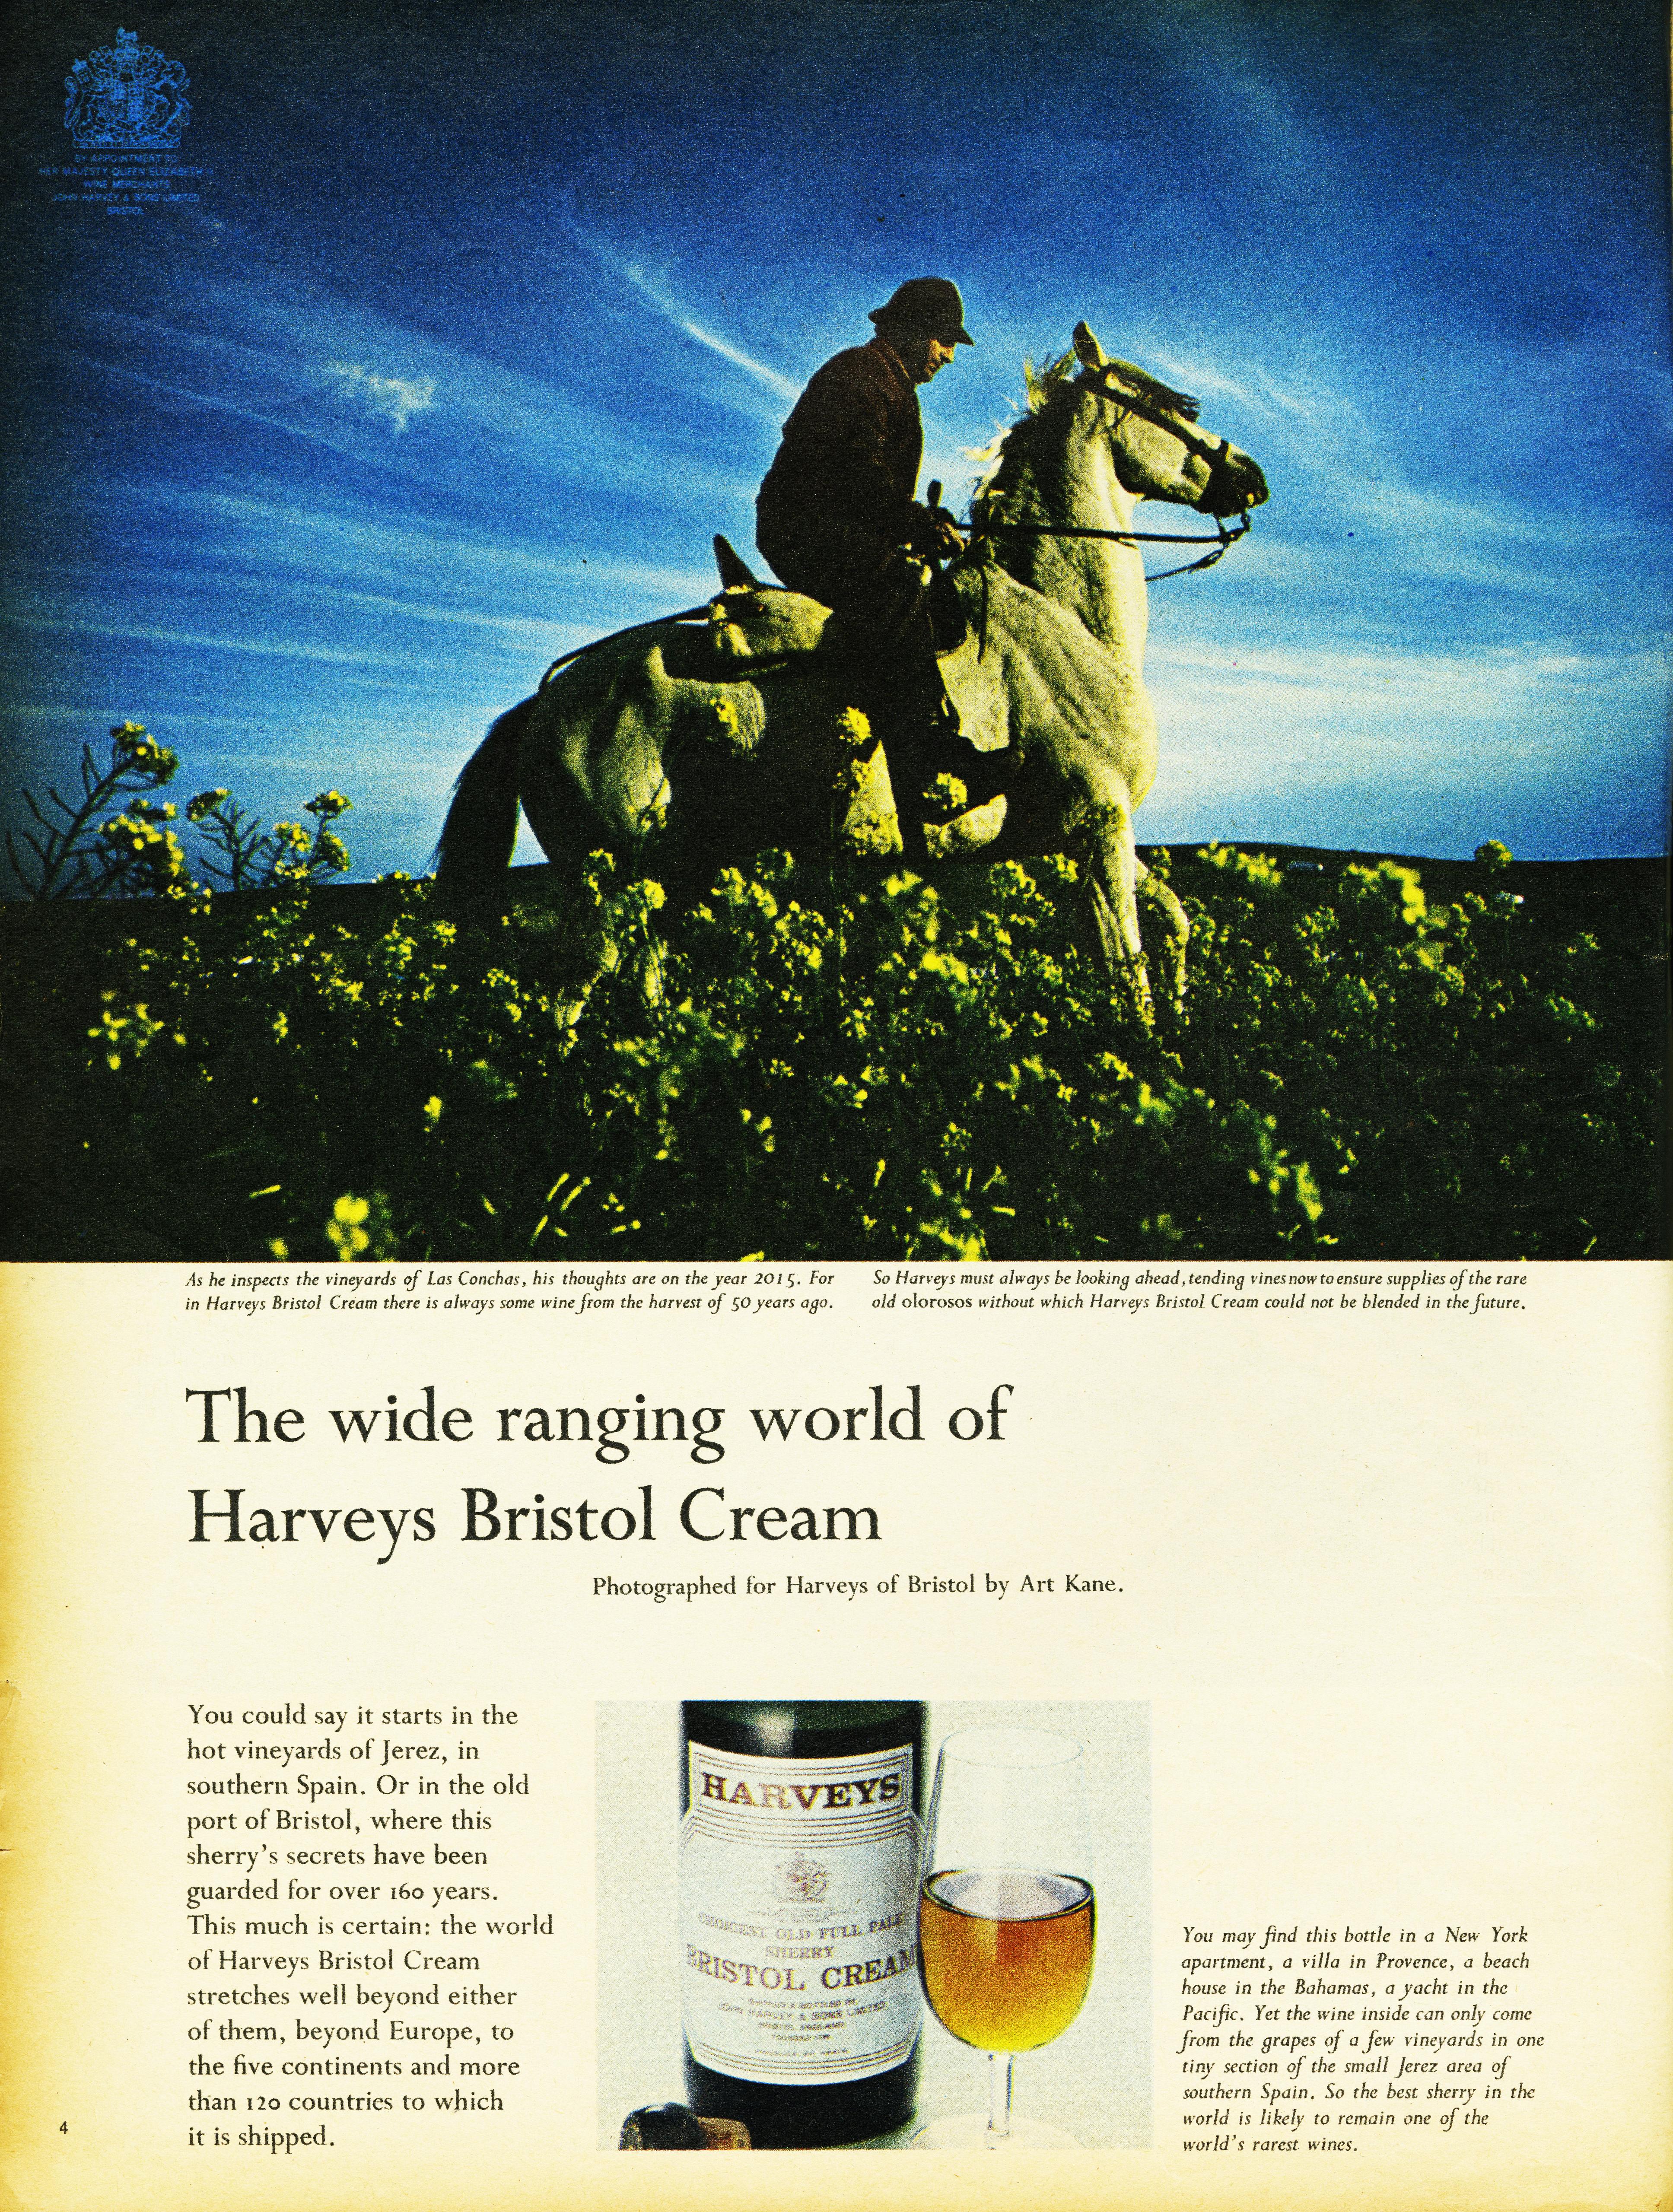 Colin Millward, Harvey's - 'Horse', Art Kane, CDP-03